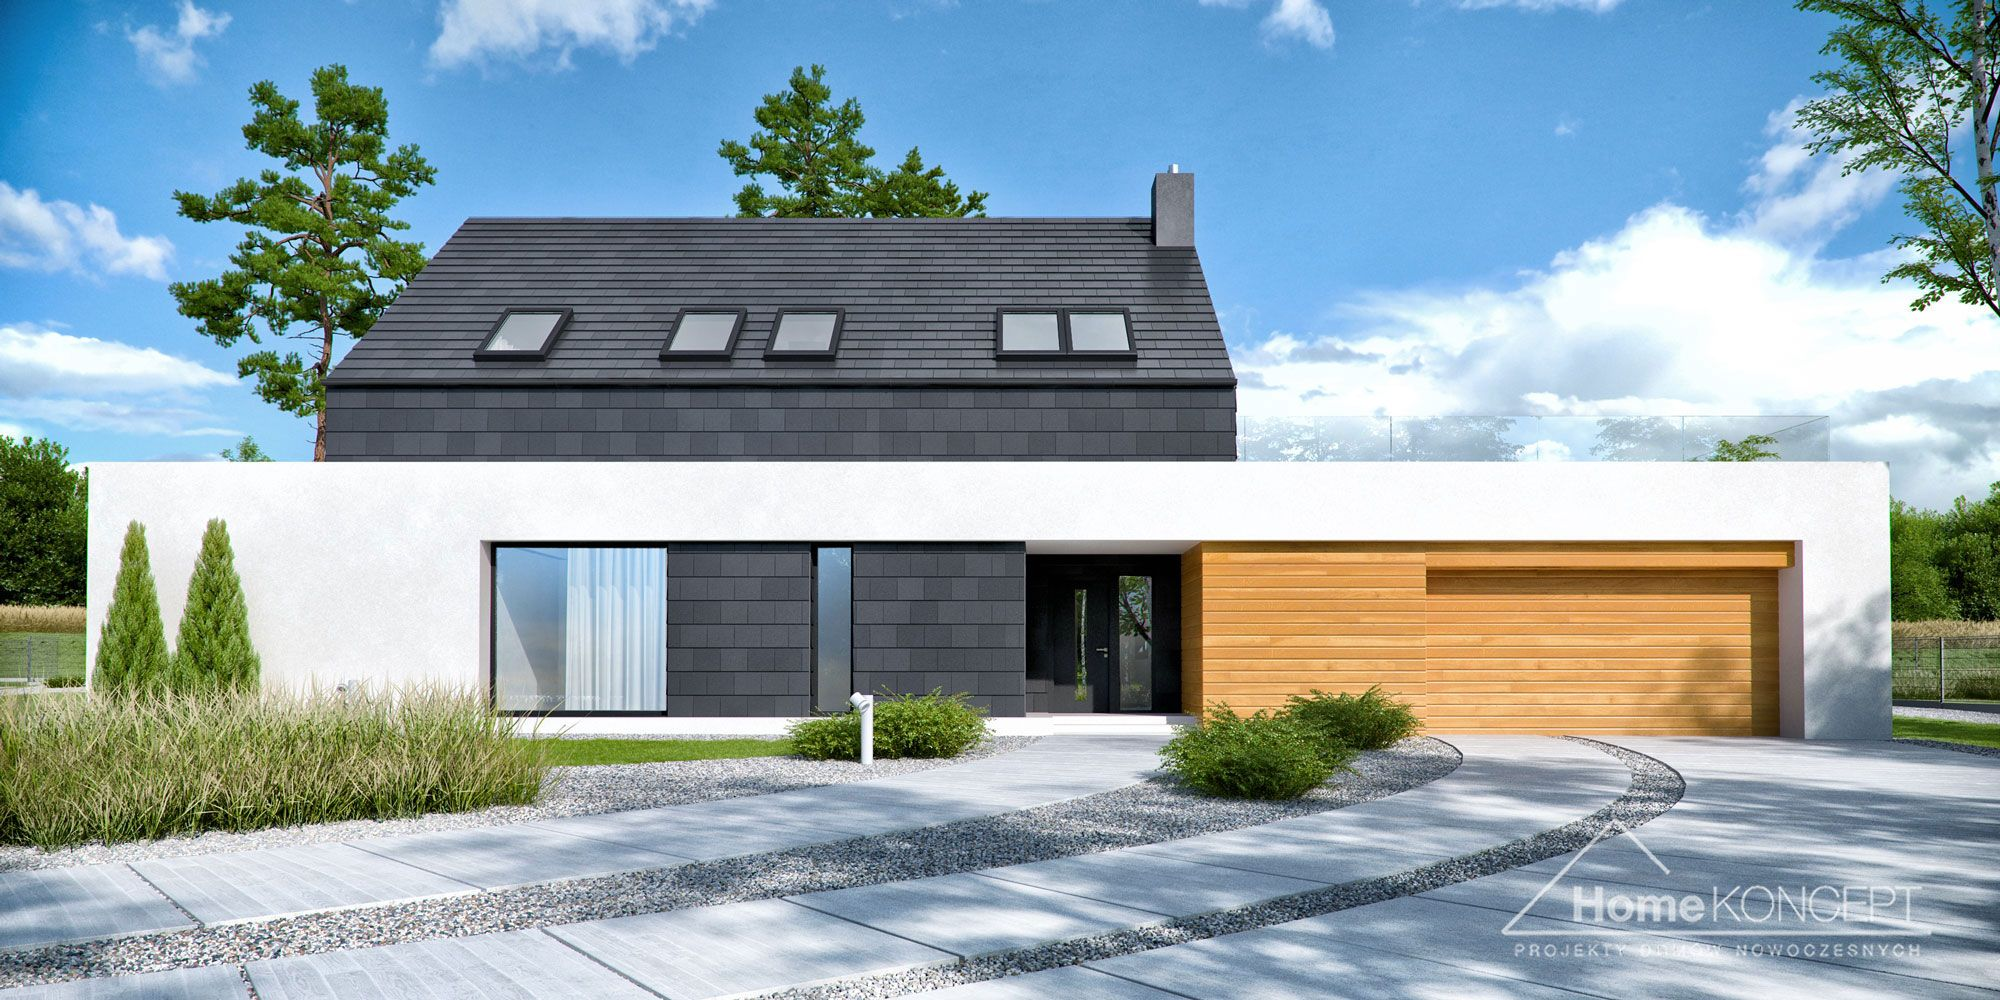 Projekt Domu Homekoncept 50 #Homekoncept #Projektdomu #Domnowoczesny #Domjednorodzinny #Stylhomekoncept #Modernhome